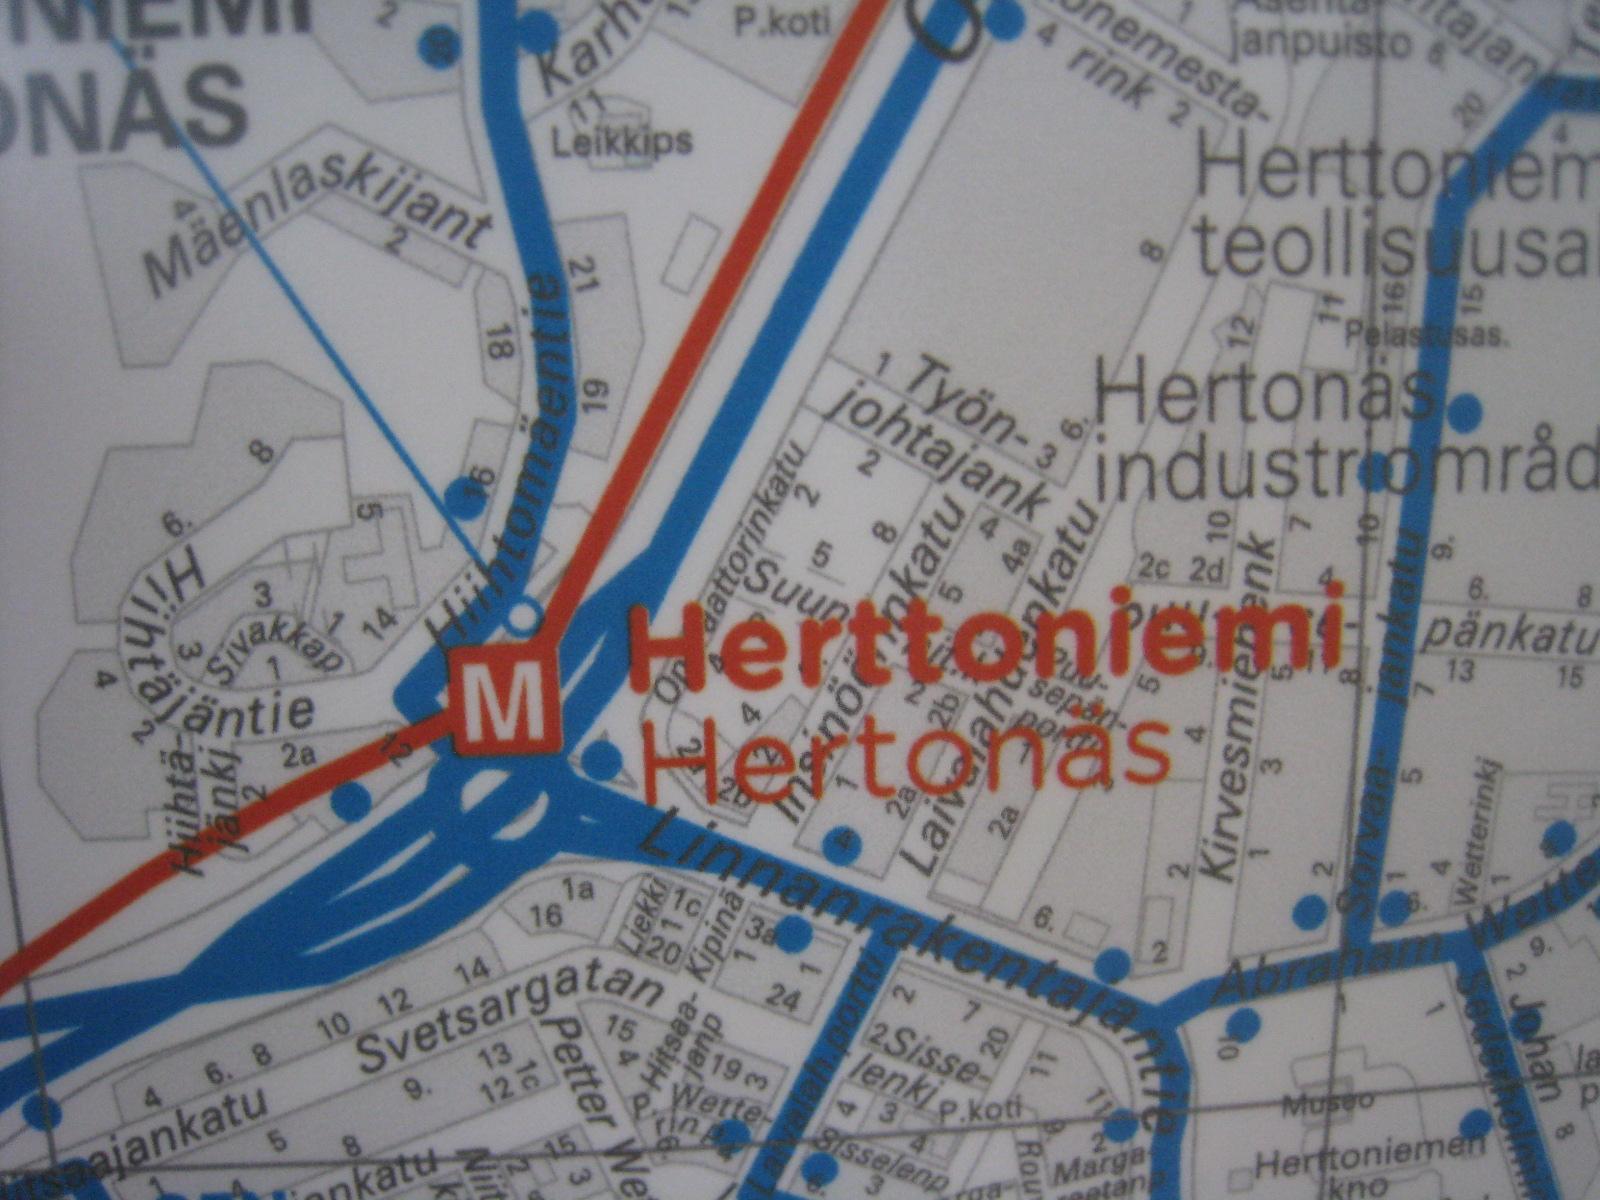 Herttoniemi Alepa